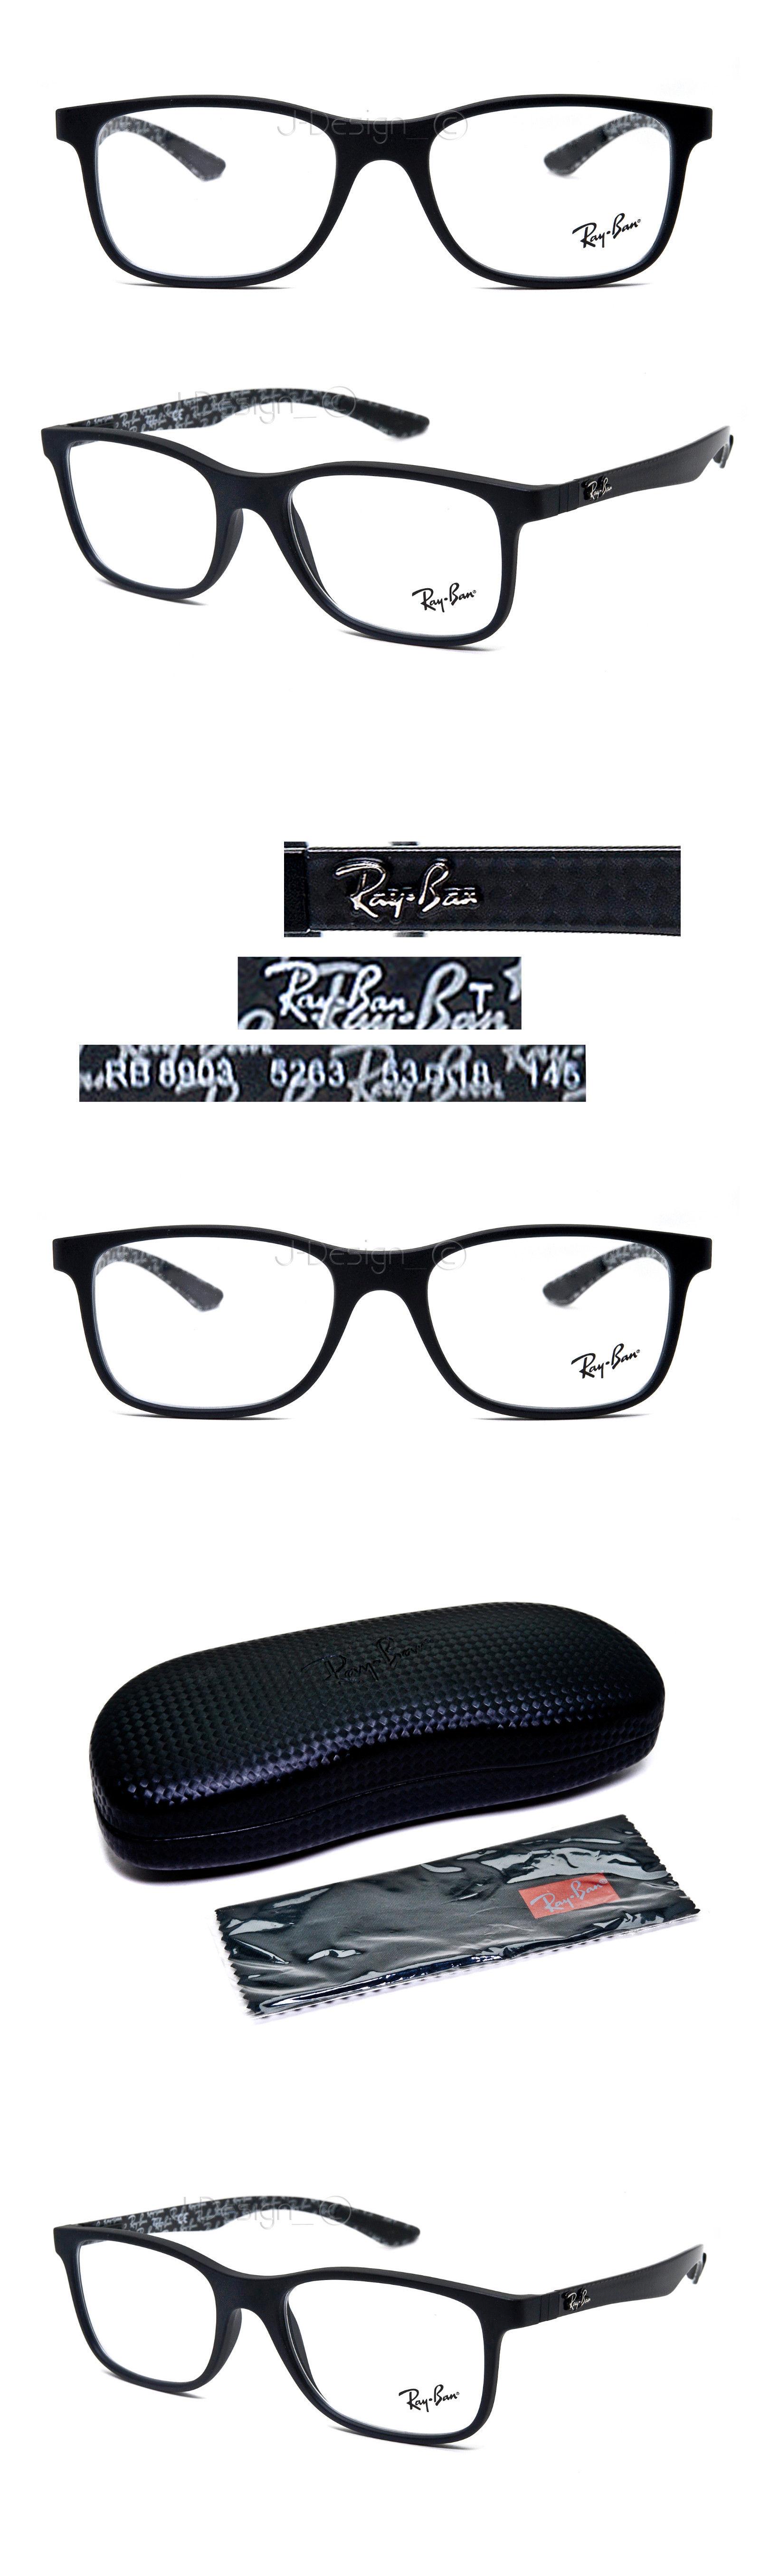 62110d8fa97 Eyeglass Frames  Ray Ban Rb 8903 5263 Carbon Matte Black 53 18 145 Eyeglasses  Rx